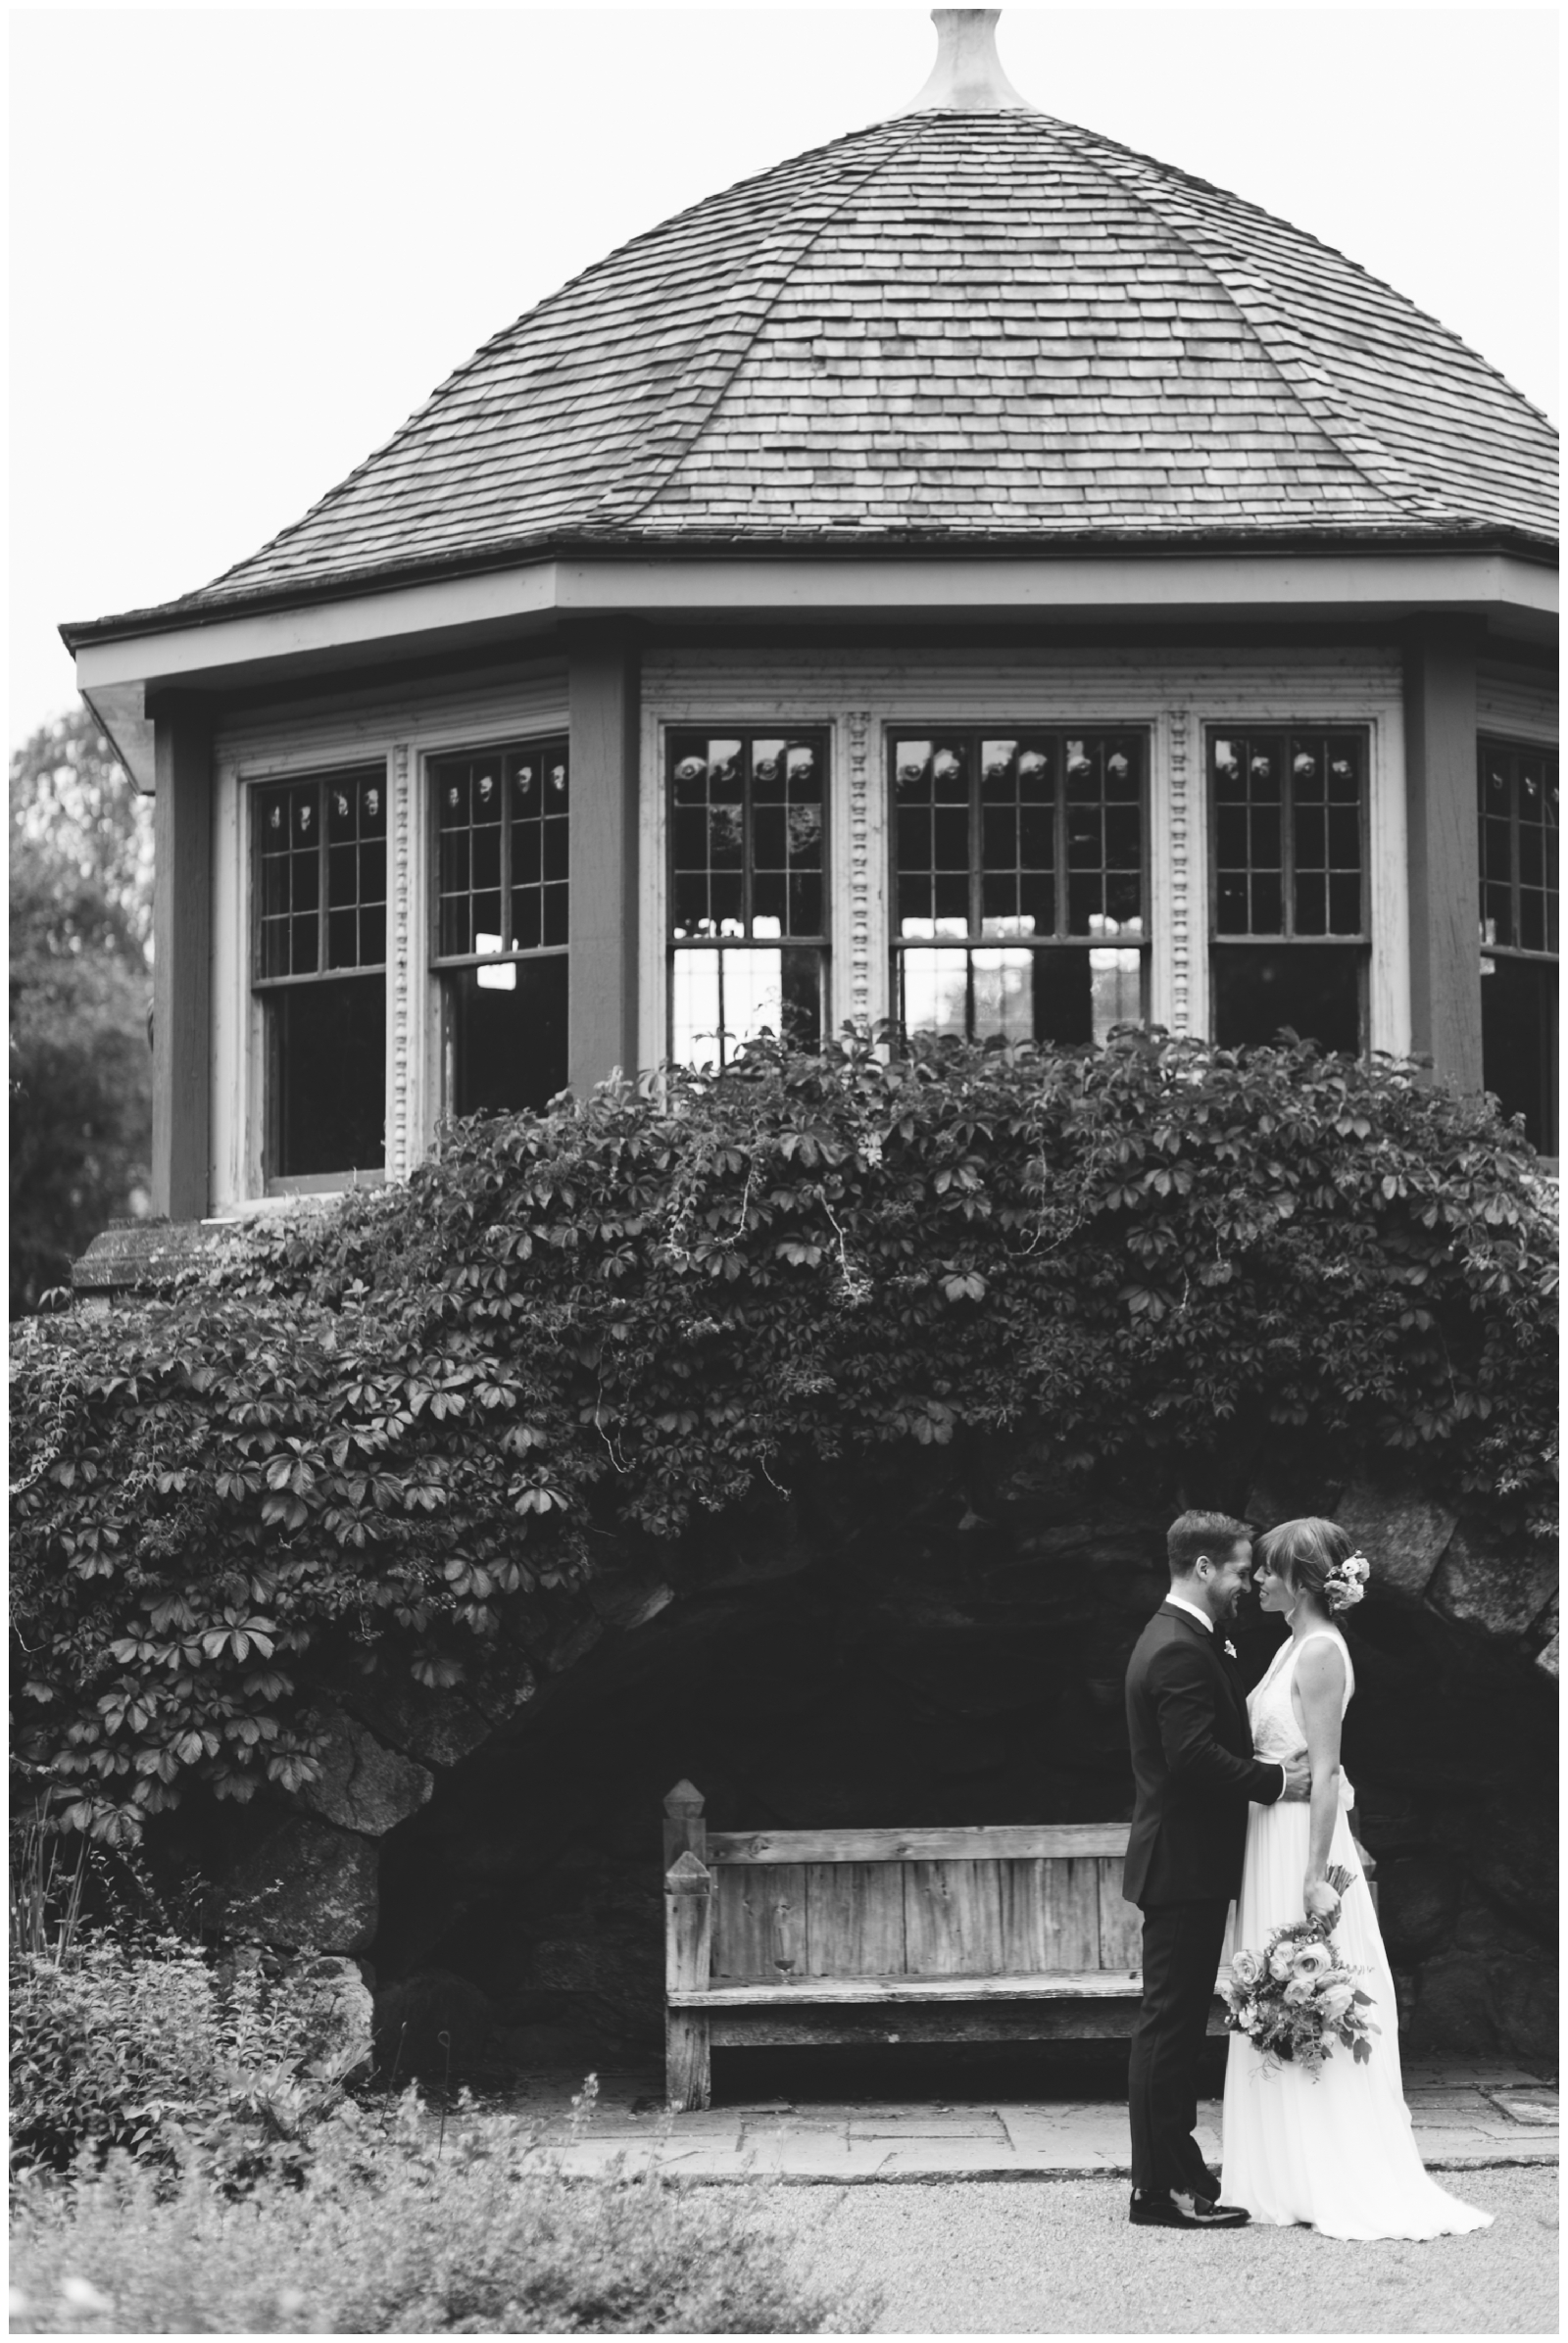 Moraine-Farm-wedding-Bailey-Q-Photo-Massachusetts-wedding-photpgrapher-025.jpg